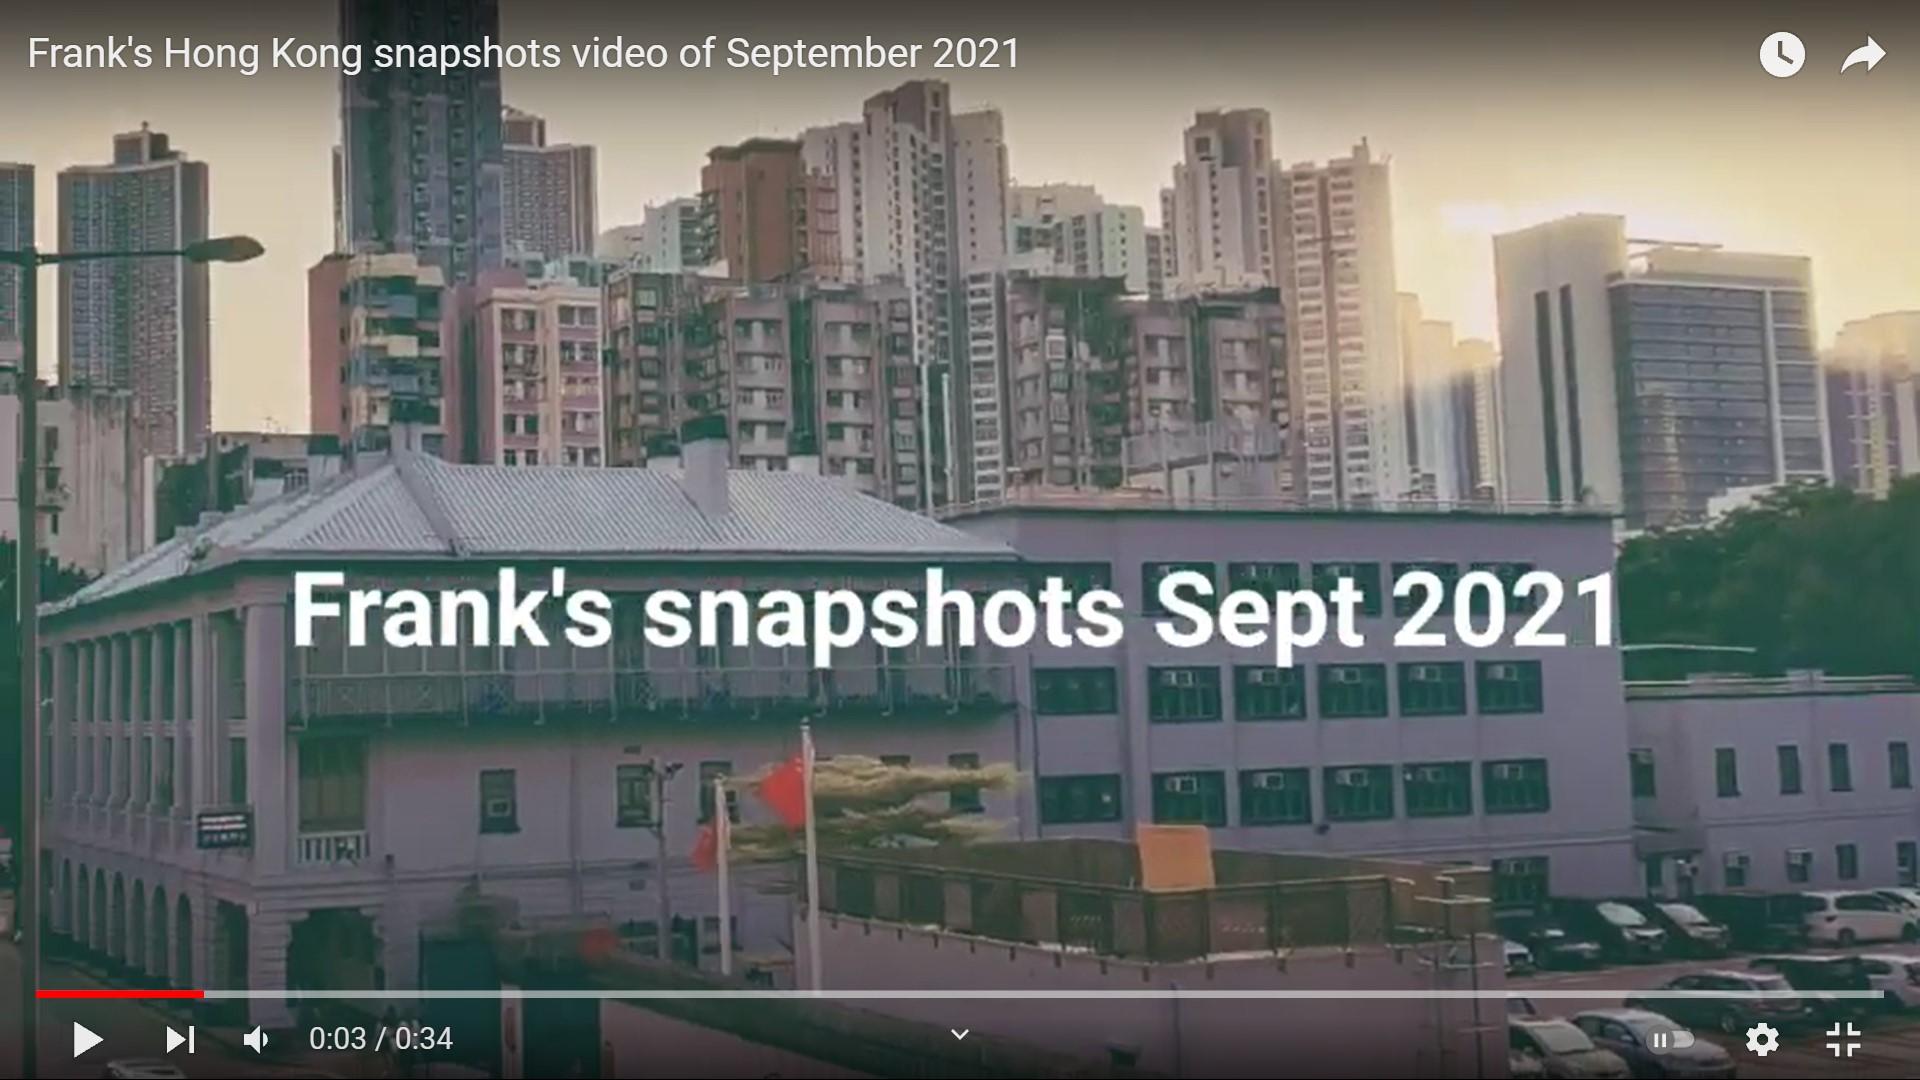 Frank's Sept 2021 snapshots video of Hong Kong